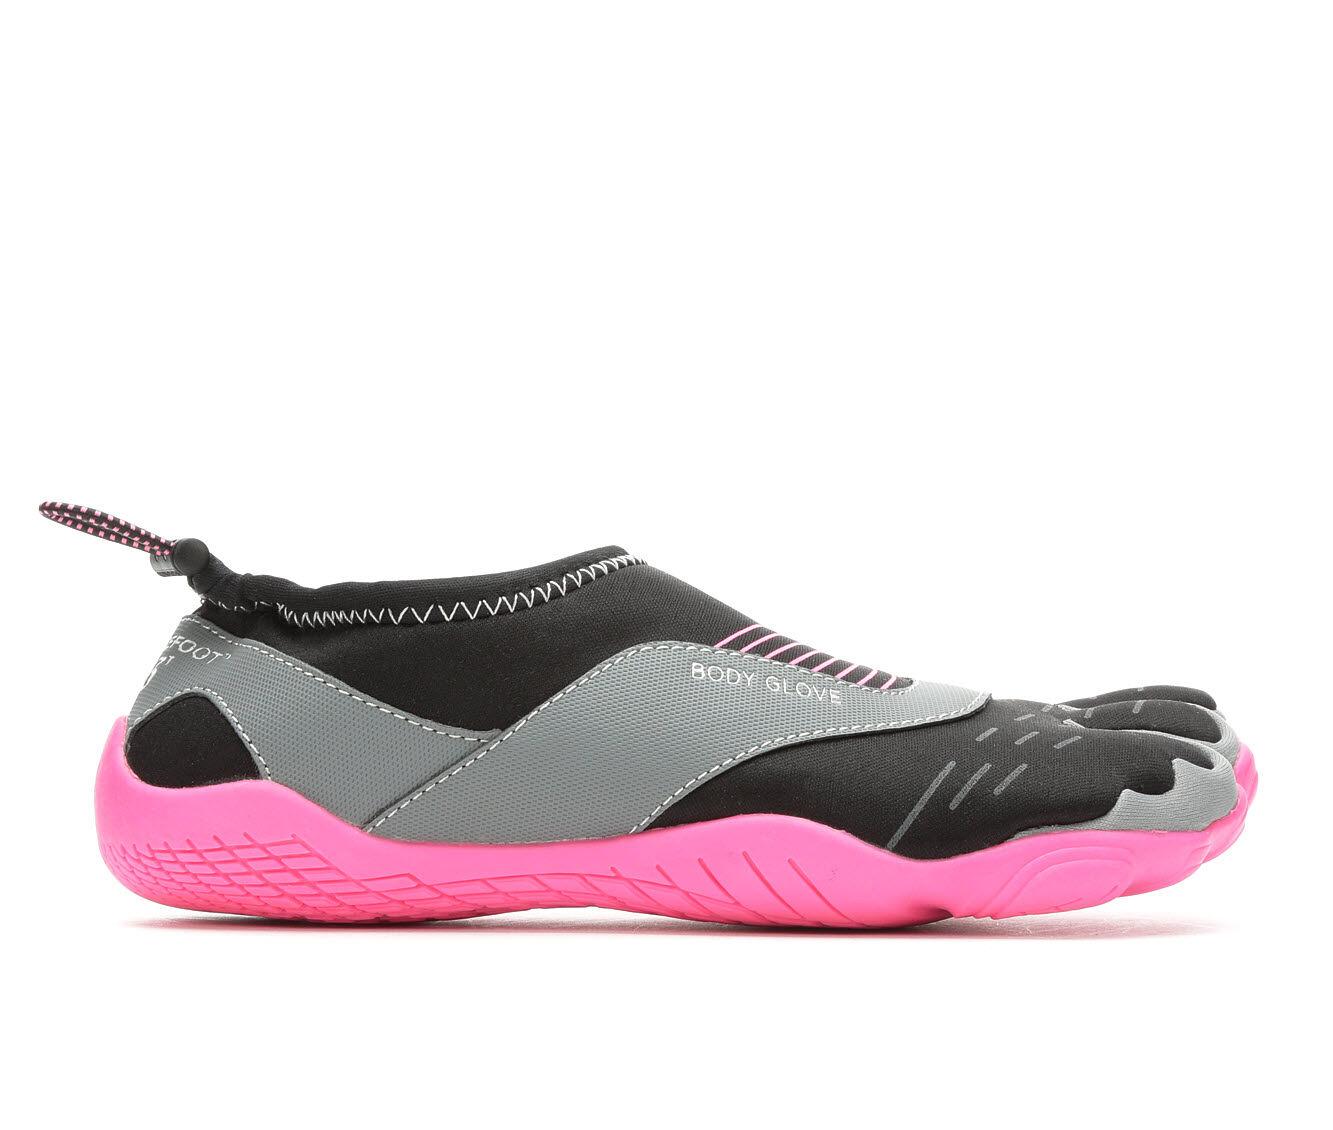 Women's Body Glove Hydra Water Shoes Black/Flamingo